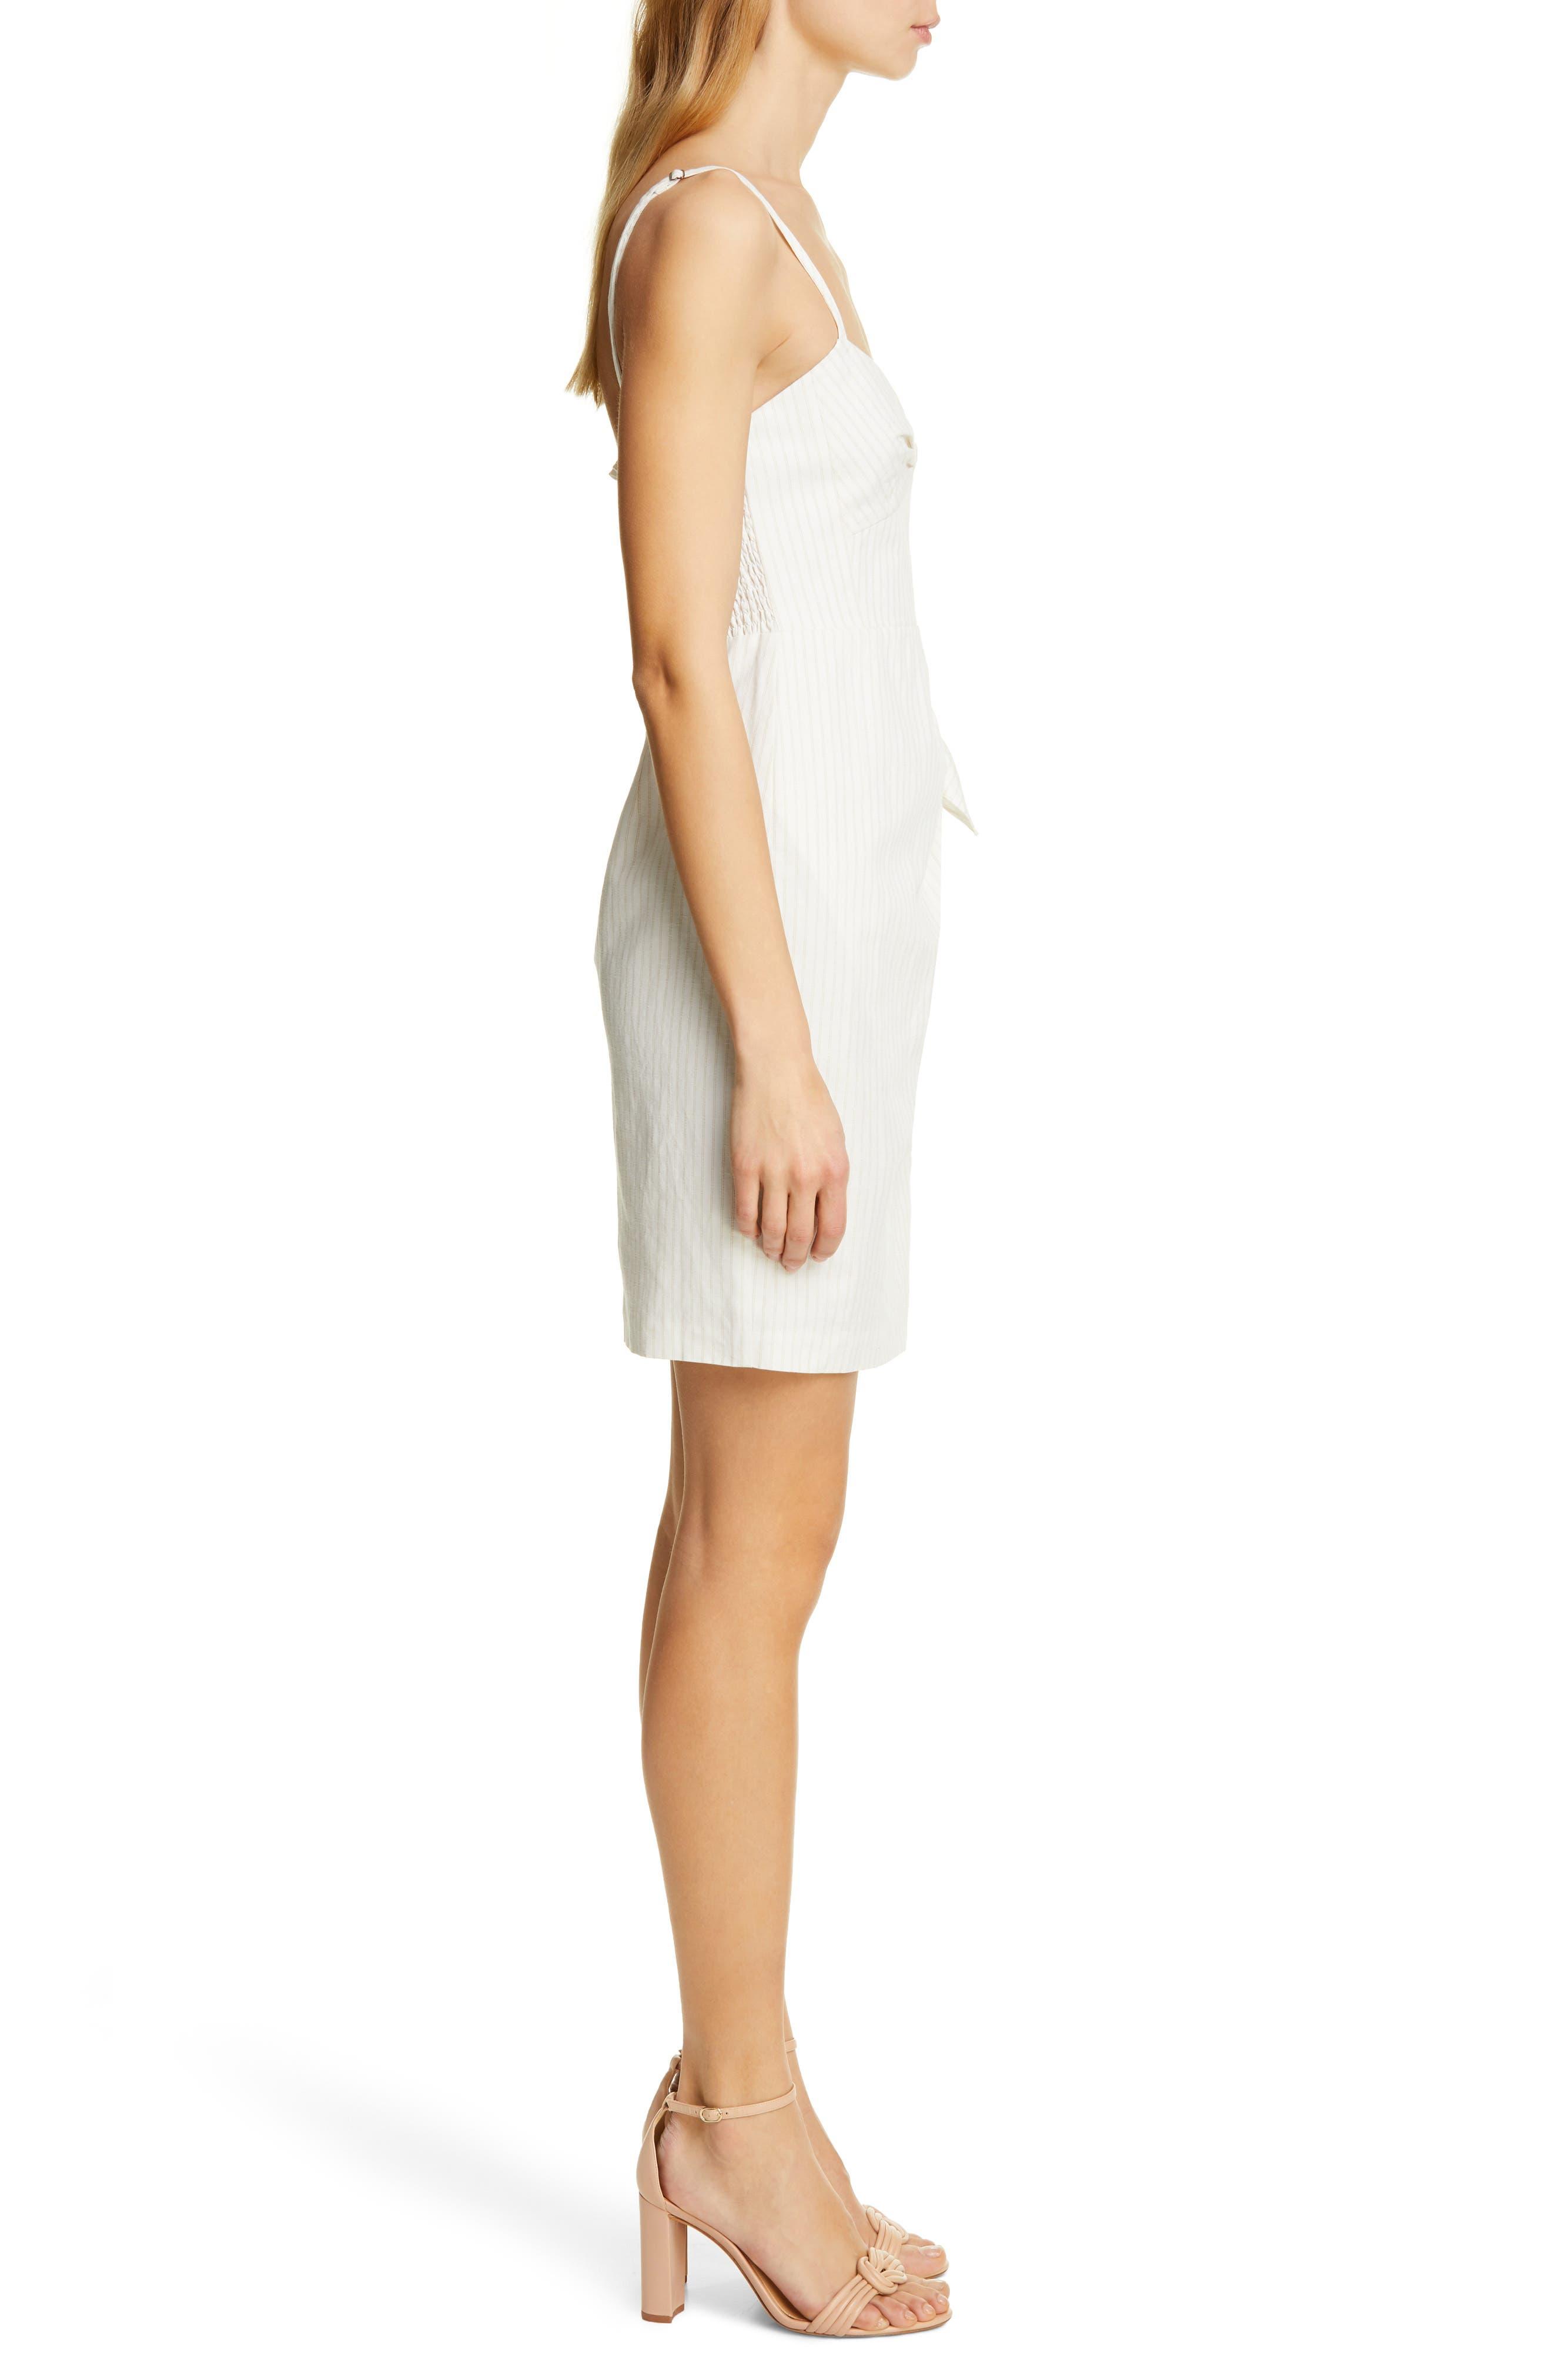 REBECCA TAYLOR, Pinstripe Cotton & Linen Dress, Alternate thumbnail 3, color, SNOW COMBO